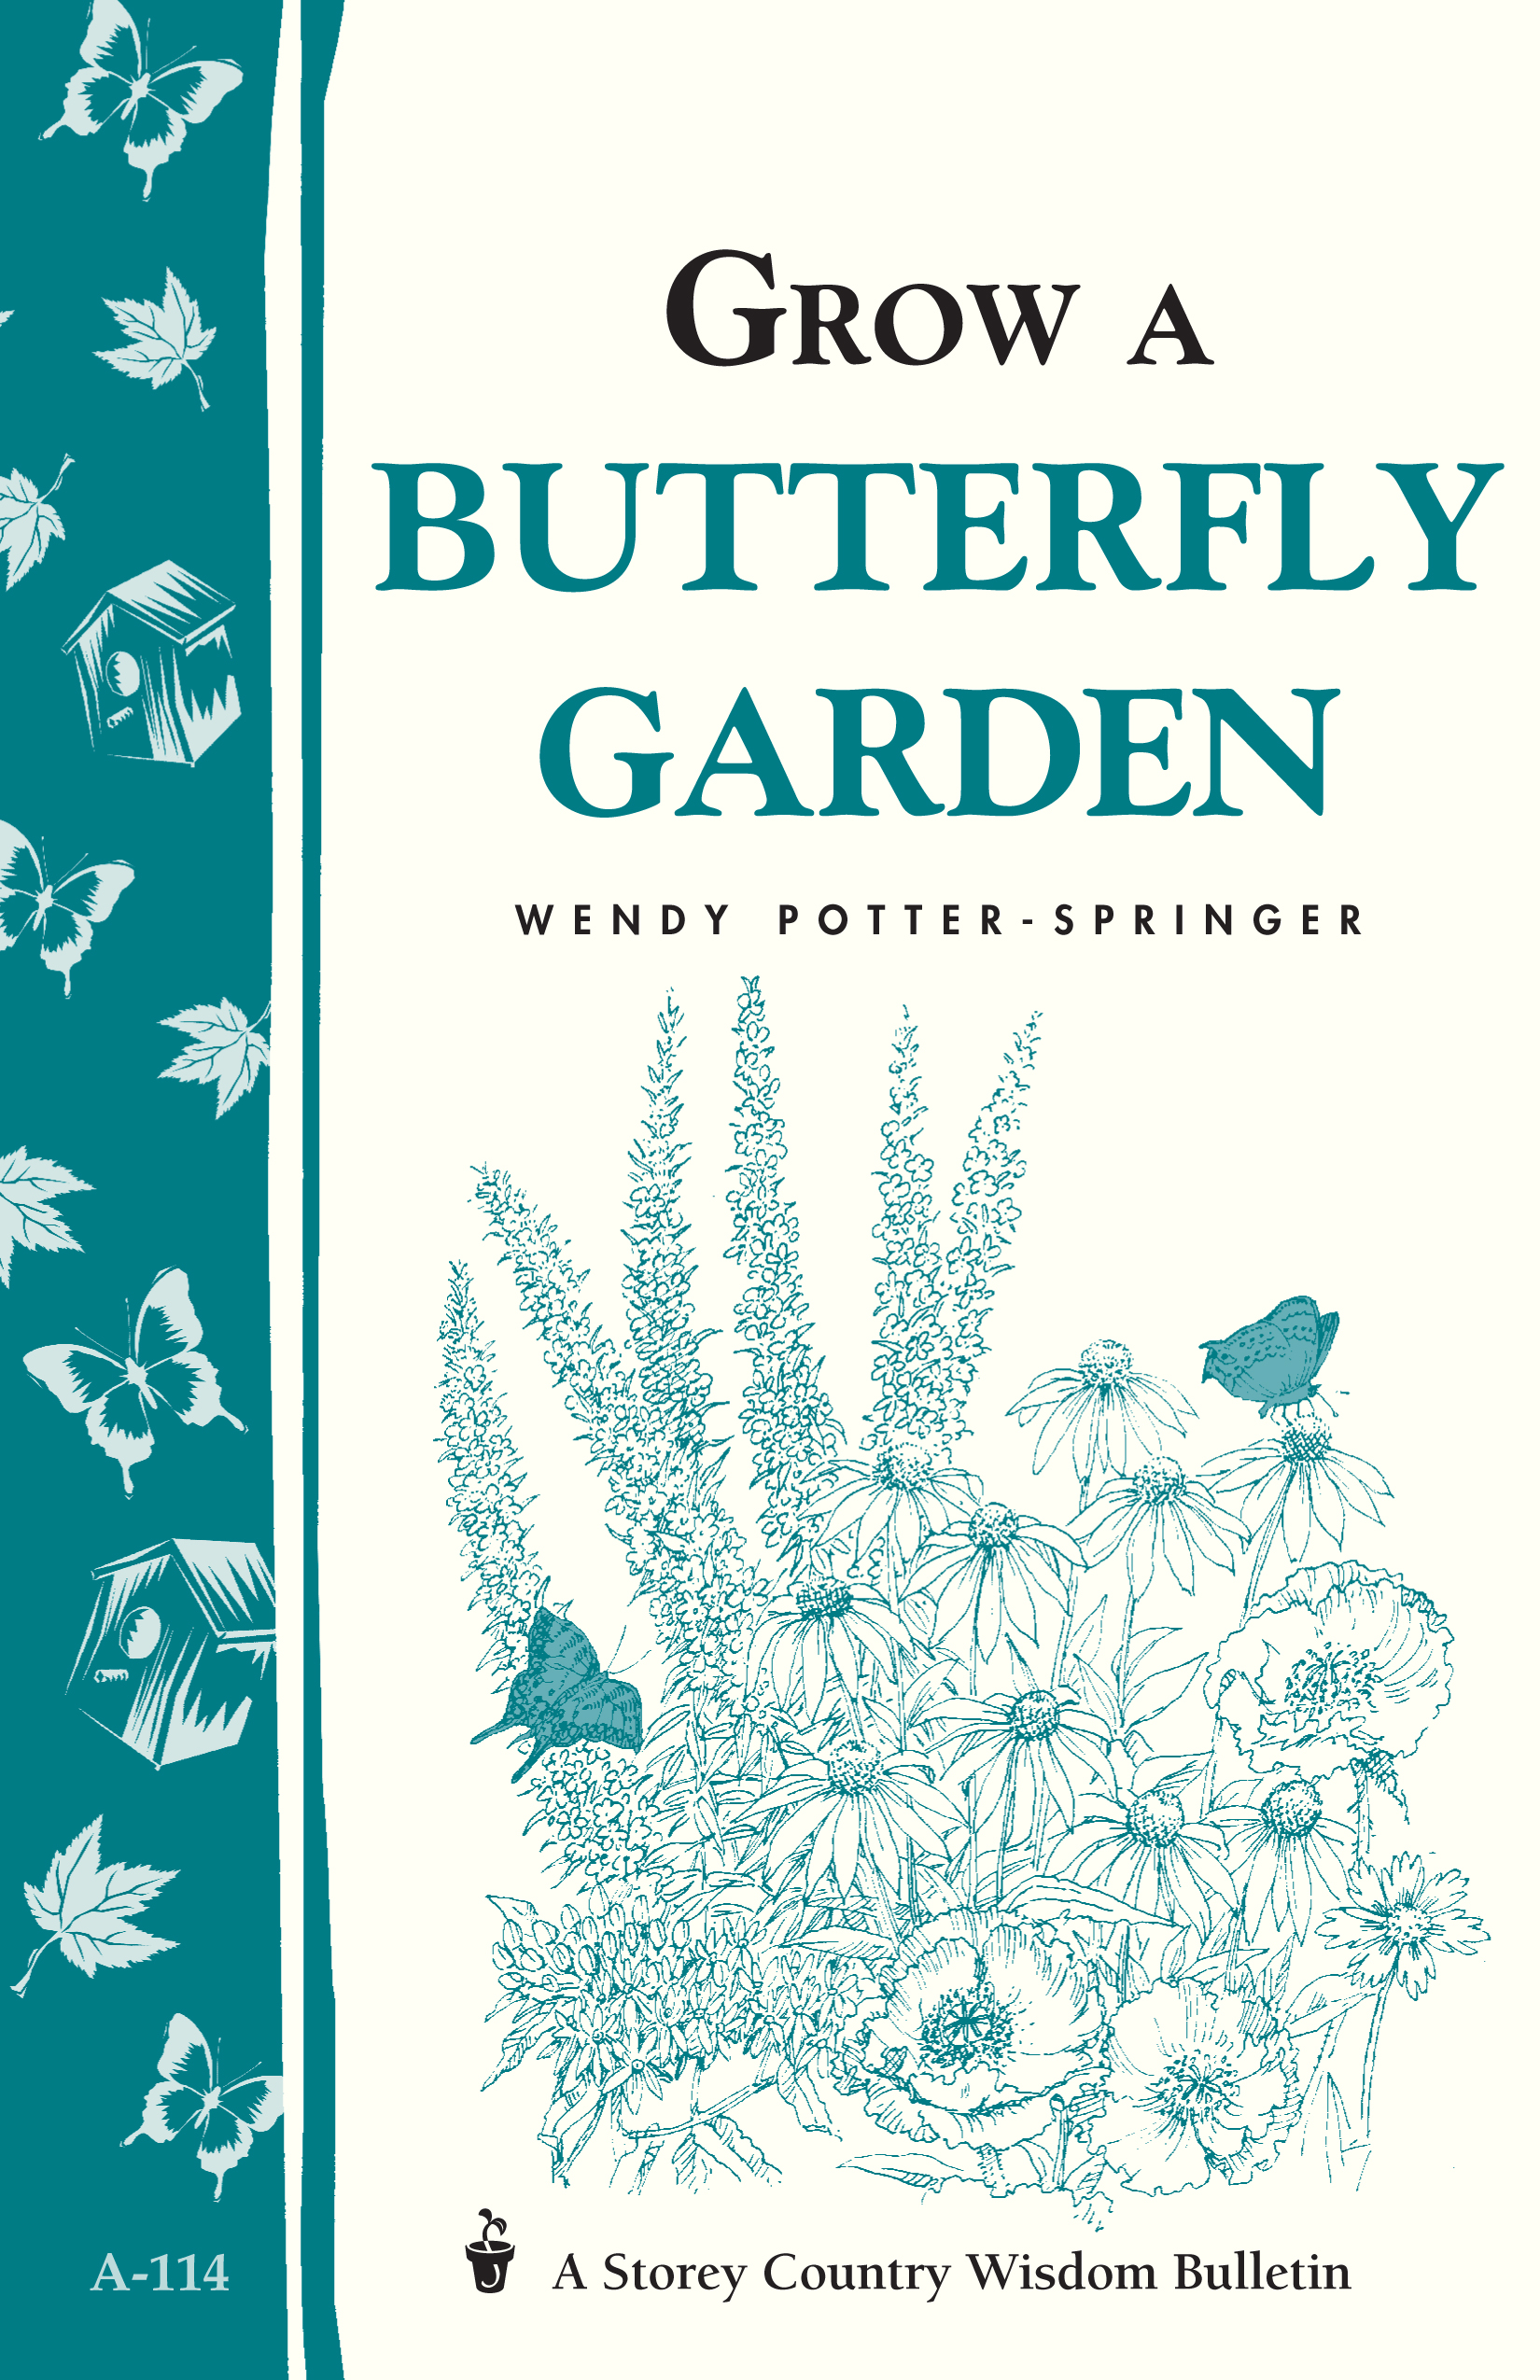 Grow a Butterfly Garden Storey Country Wisdom Bulletin A-114 - Wendy Potter-Springer